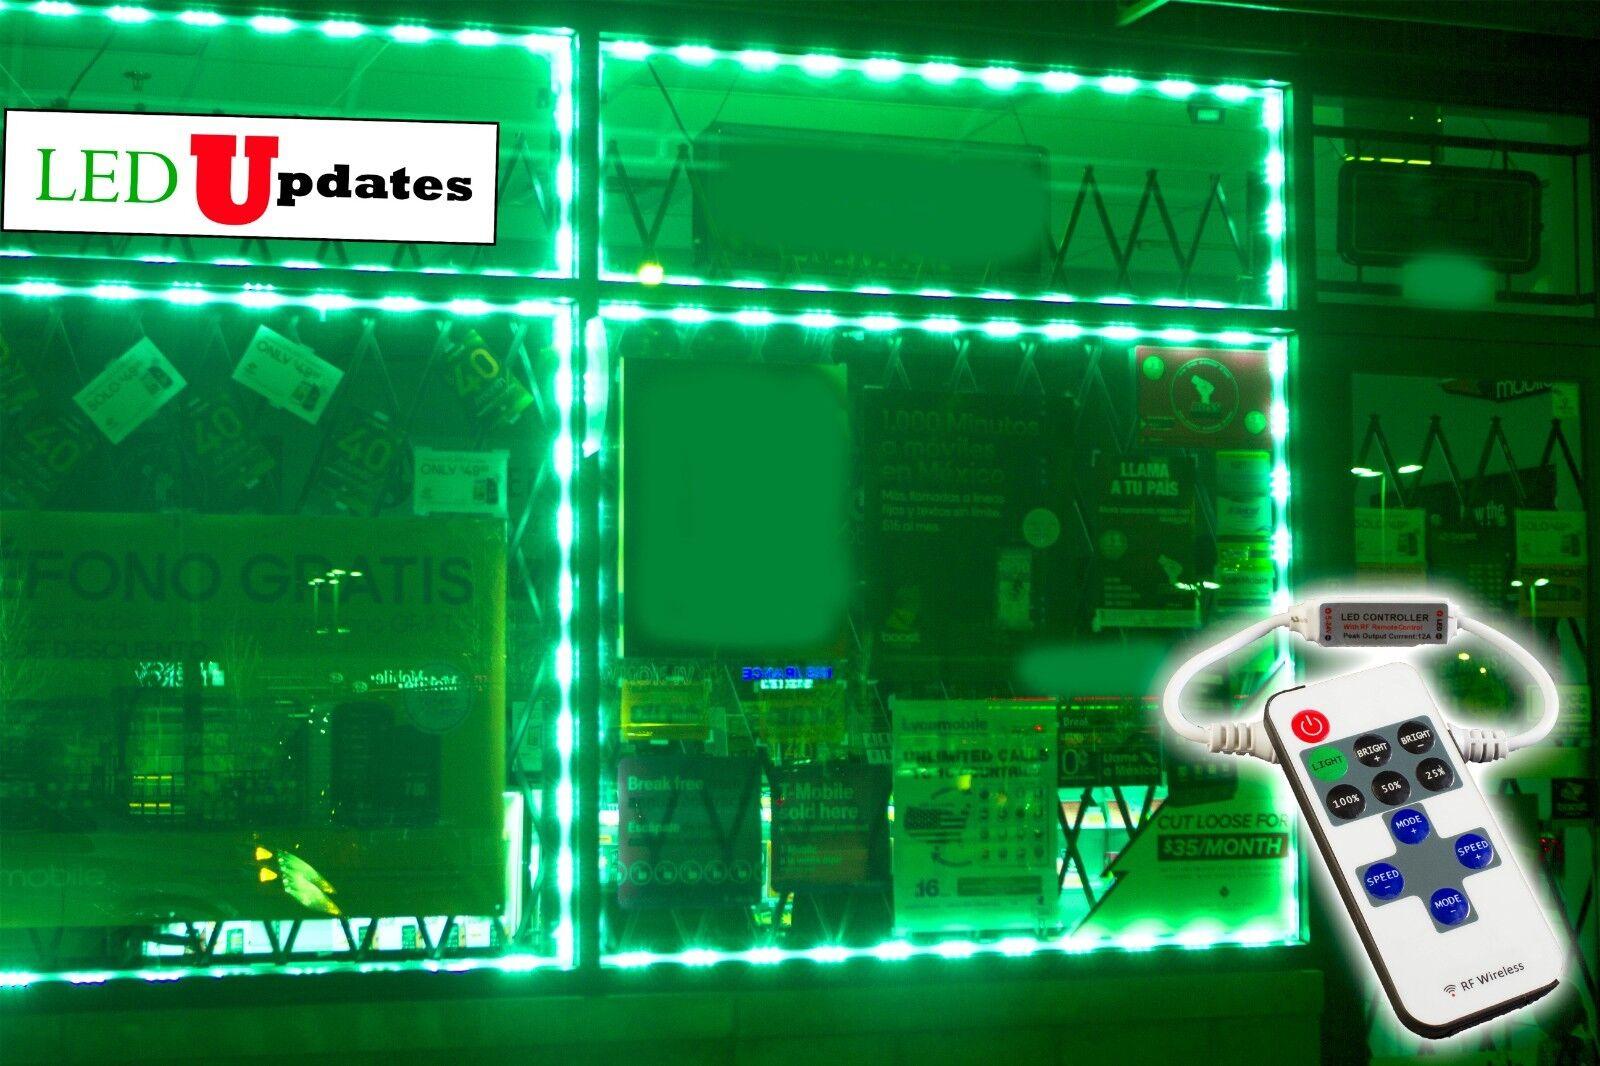 LEDUPDATES 40ft  Flash STOREFRONT WINDOW Grün LED LIGHT 5050 UL Power & Remote